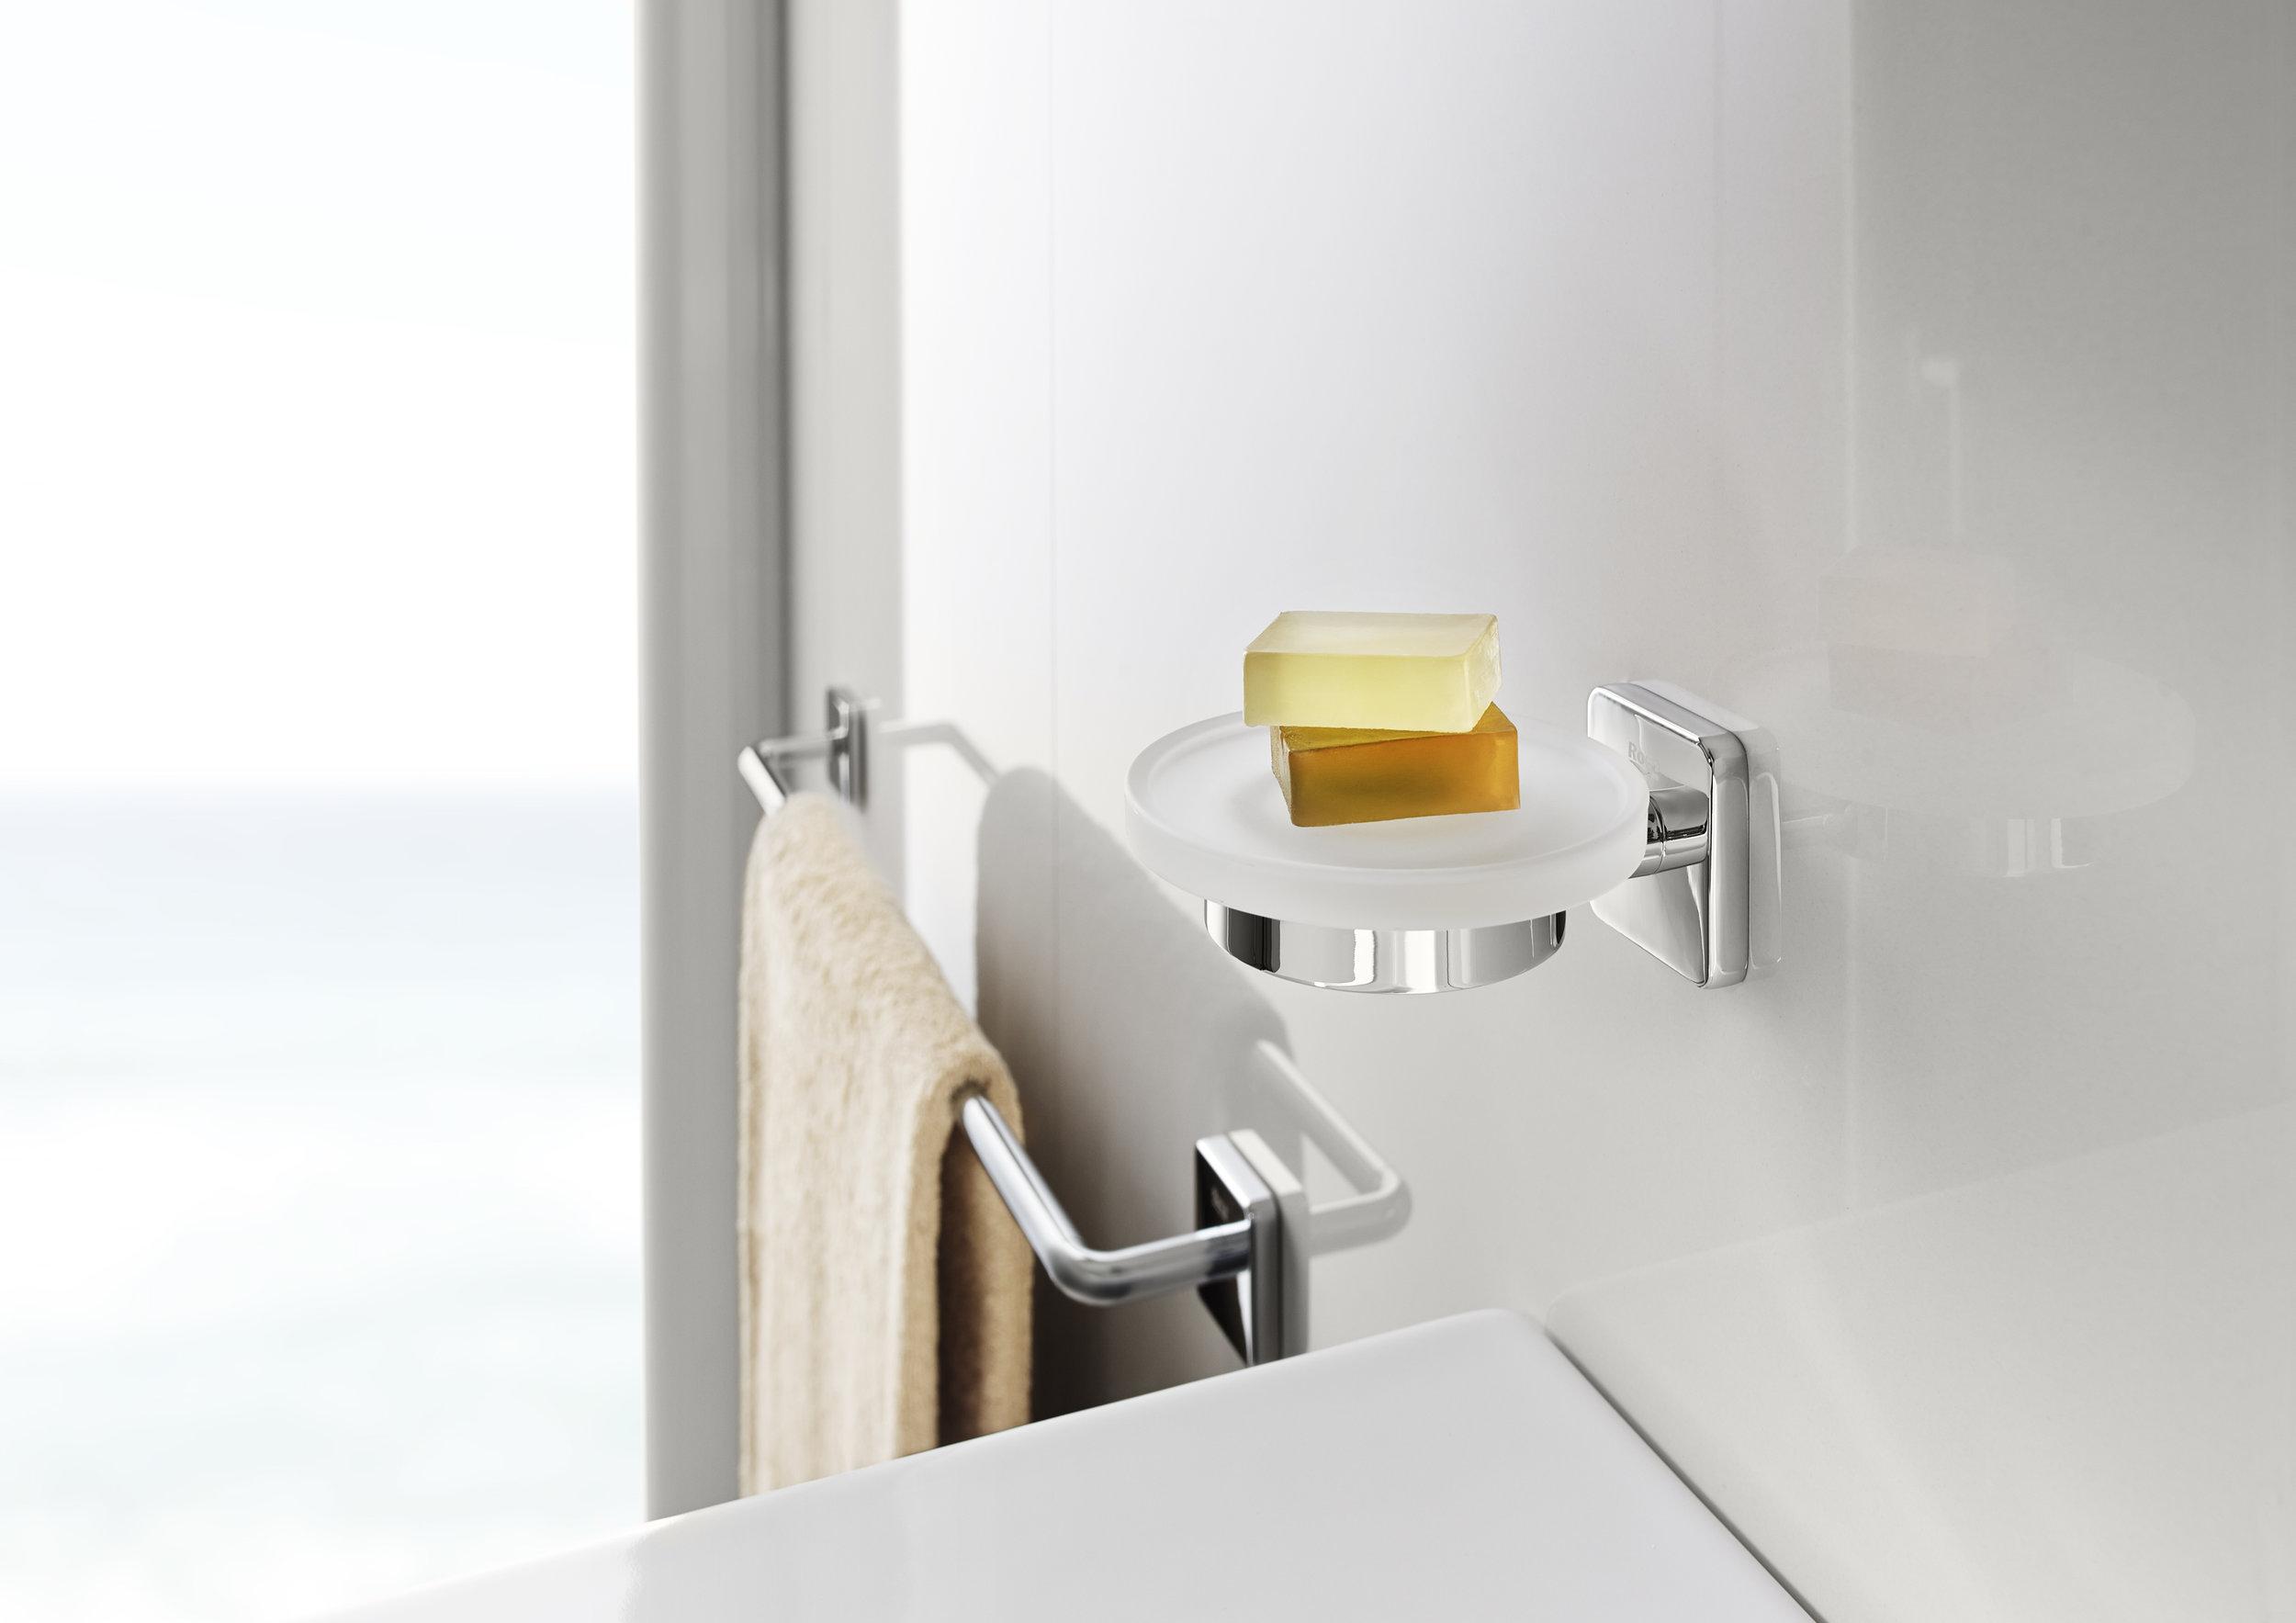 816683001 Soap dish and 816656001 towel rail.jpg